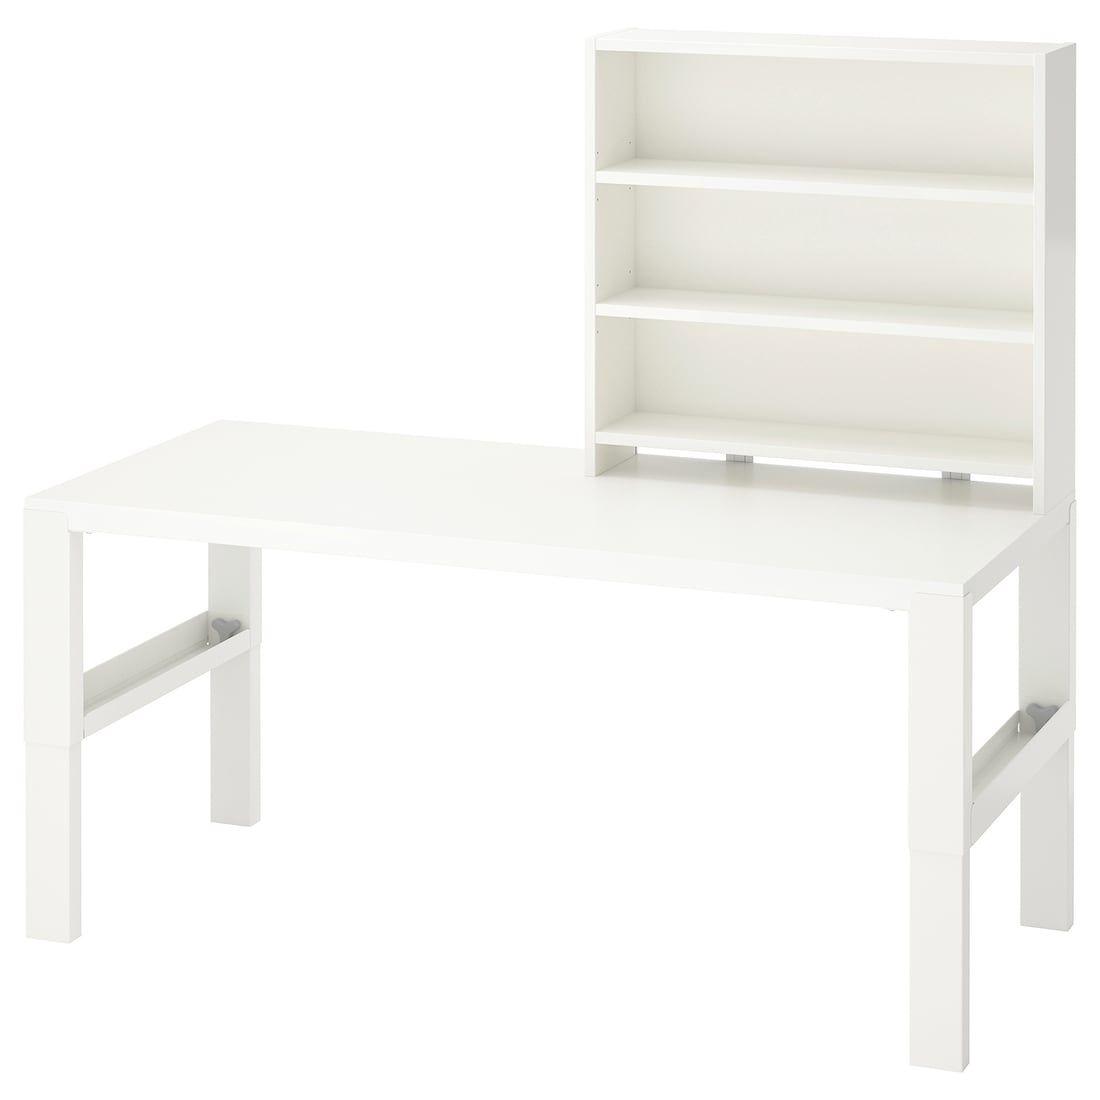 Pahl Desk With Add On Unit White 128x58 Cm Find It Here Ikea In 2020 Ikea Desk Shelves White Desks